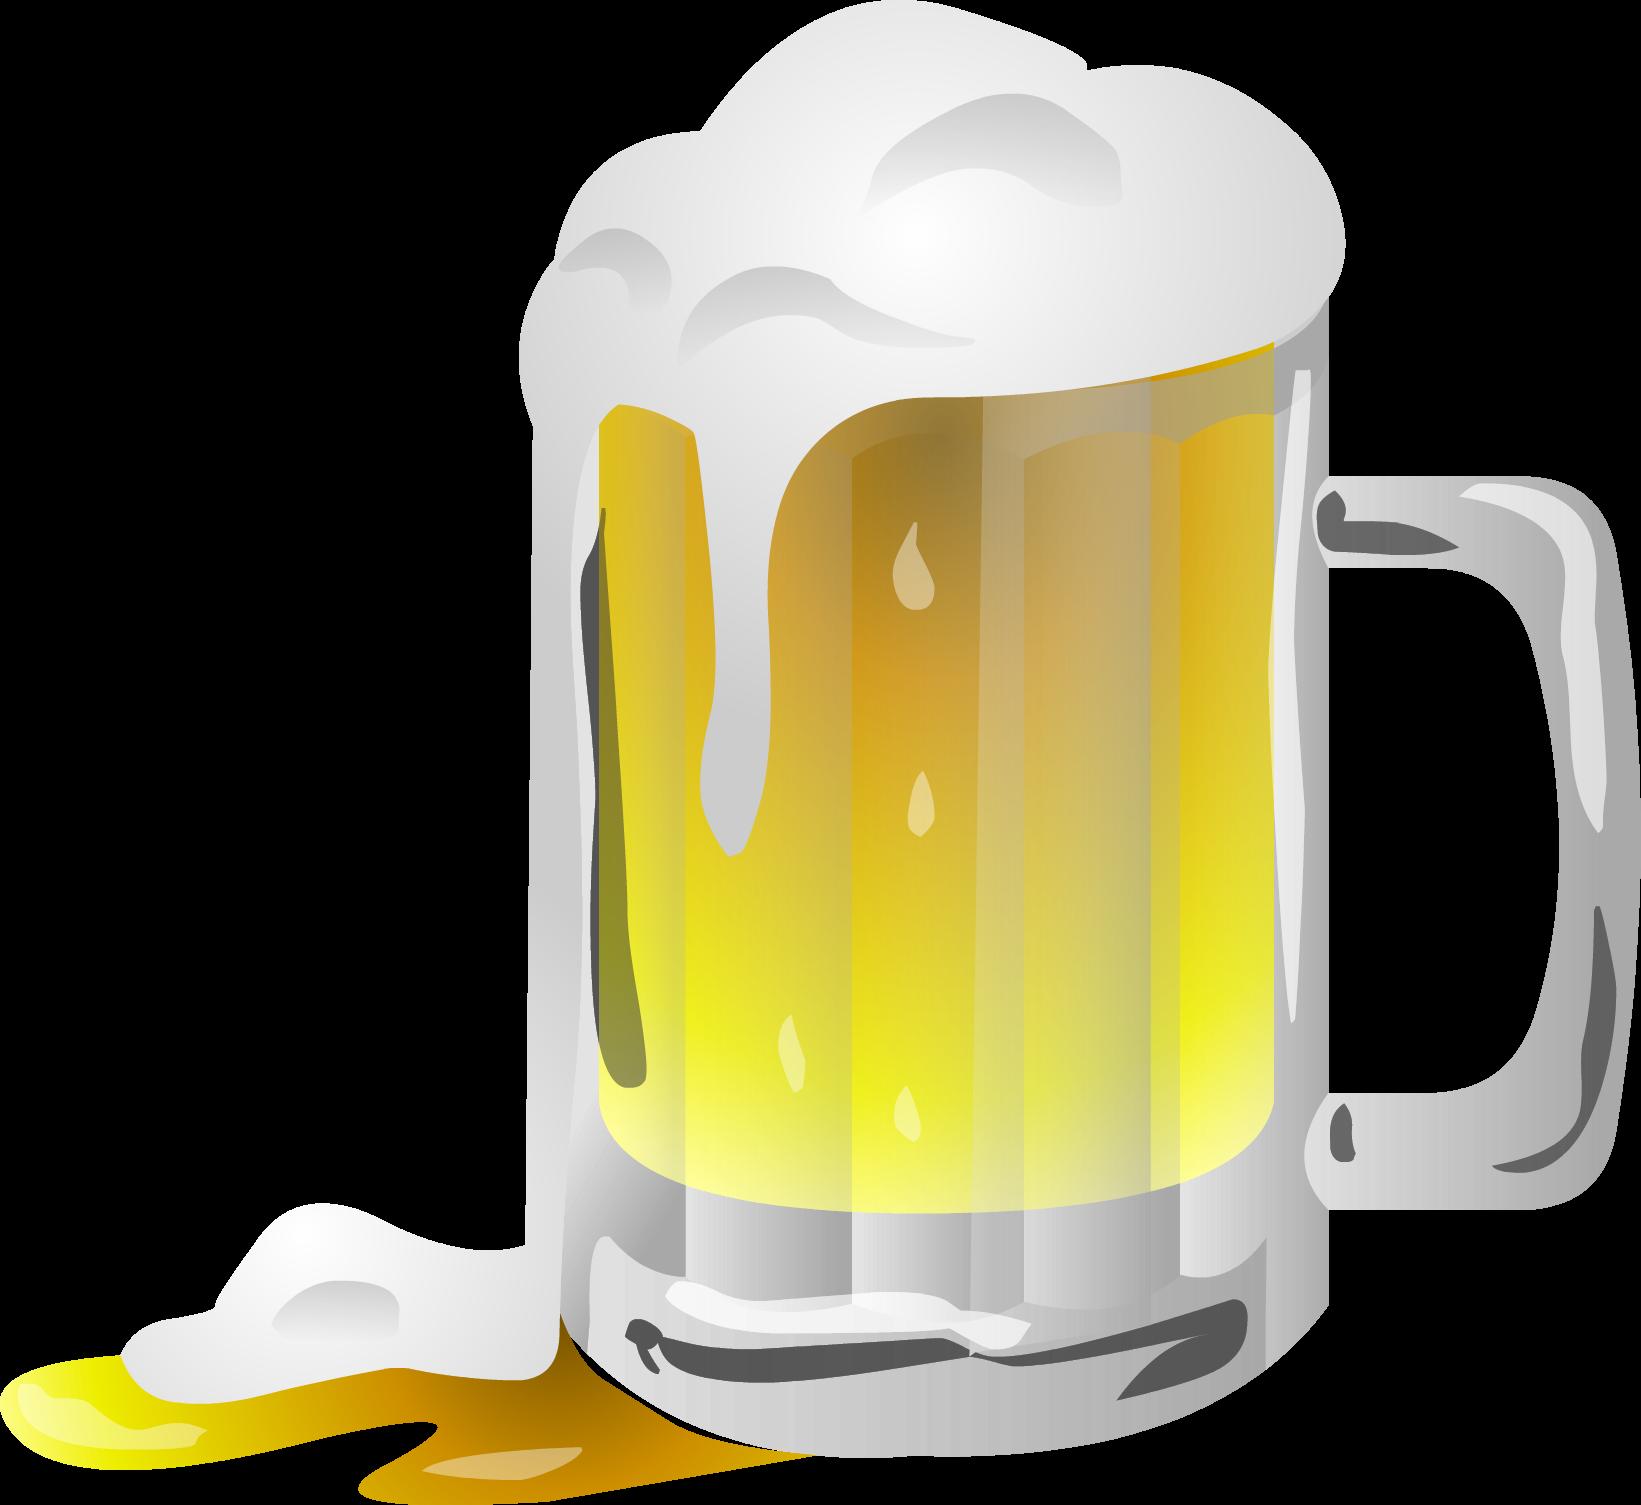 Beer Mugs Beer Mug Png Beer Mug Mugs Beer Mugs